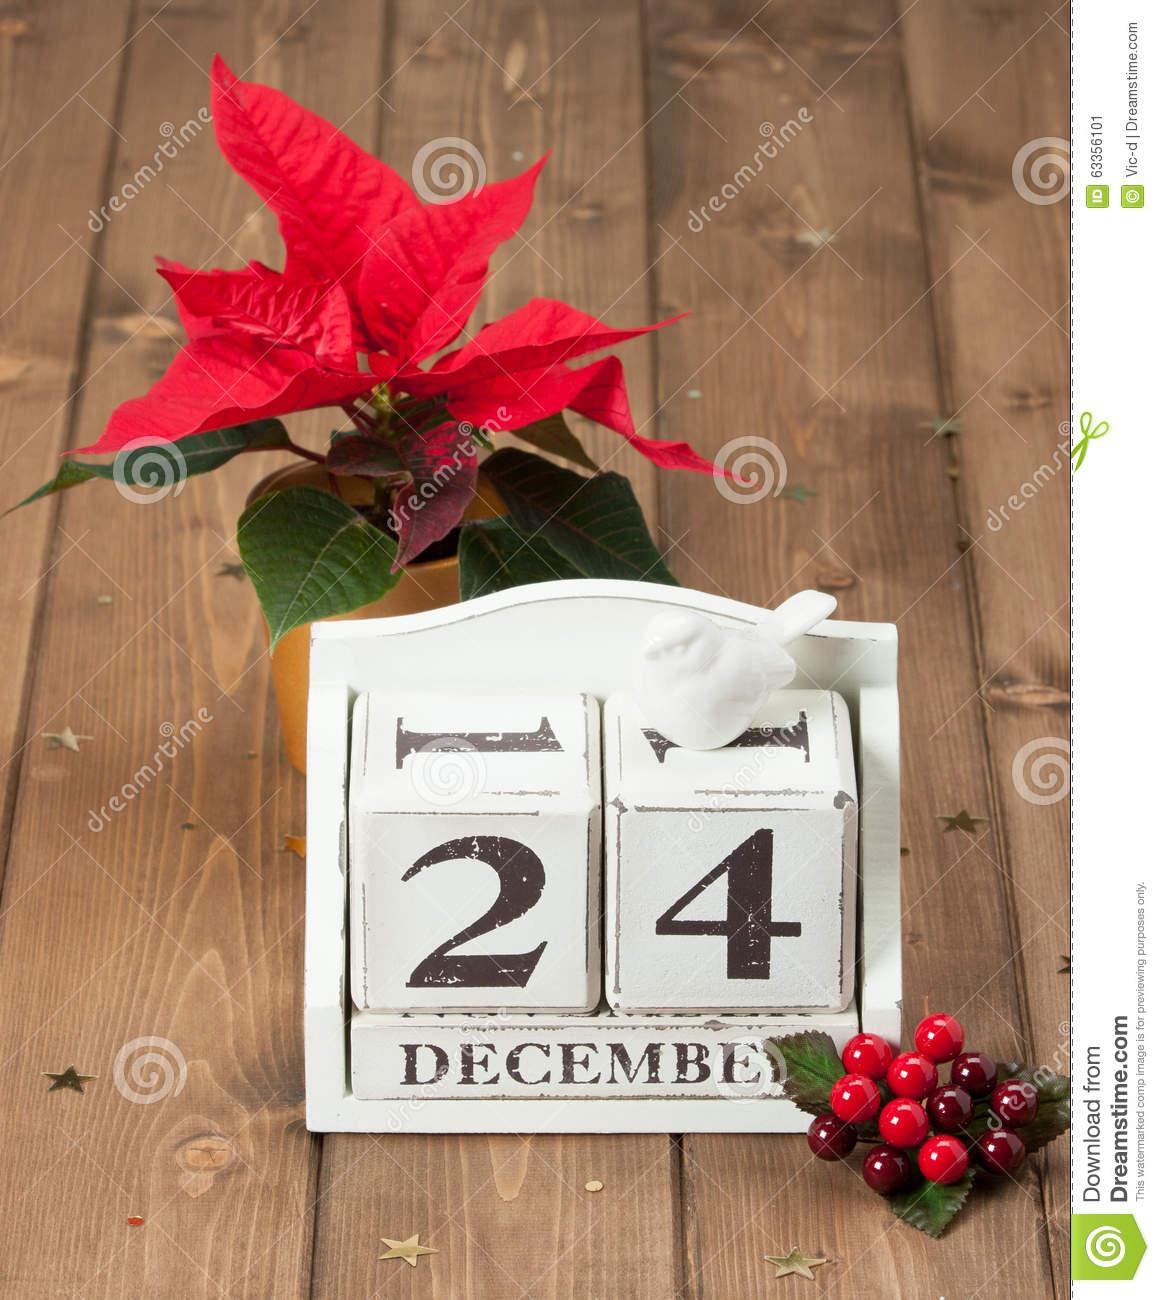 Calendar clipart december 24 banner library stock Calendar clipart december 24 - ClipartFox banner library stock